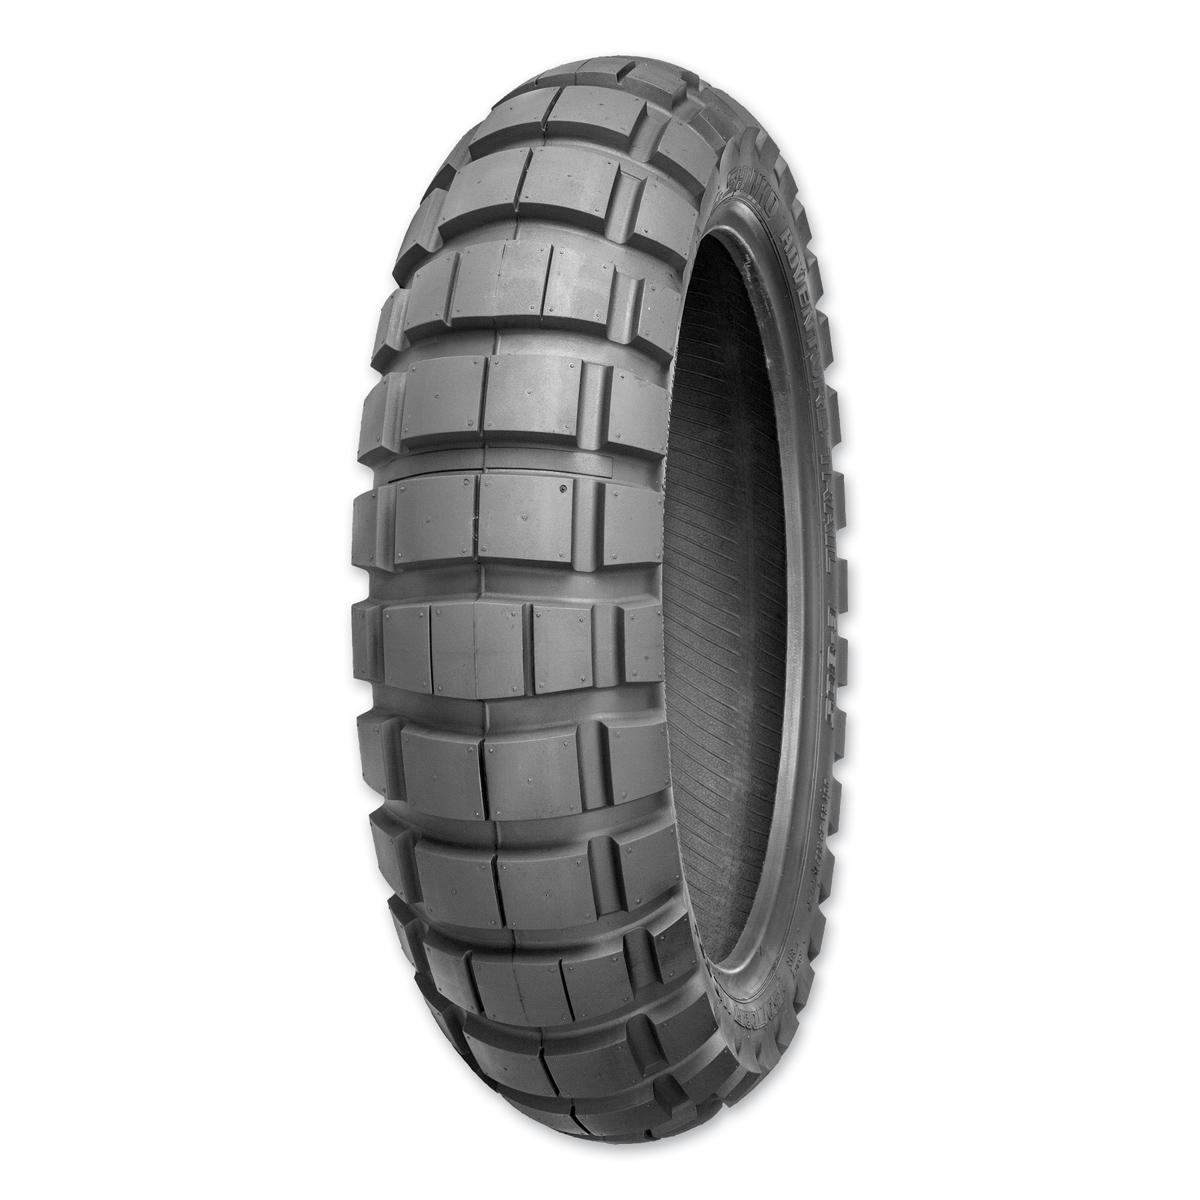 j k tyres analysis Dewan tyres analysts: this is the analysts-site for the company dewan tyres on markets insider s&p500 stocks: all 0-9 a b c d e f g h i j k l m n o p q r s t u v w x y z.